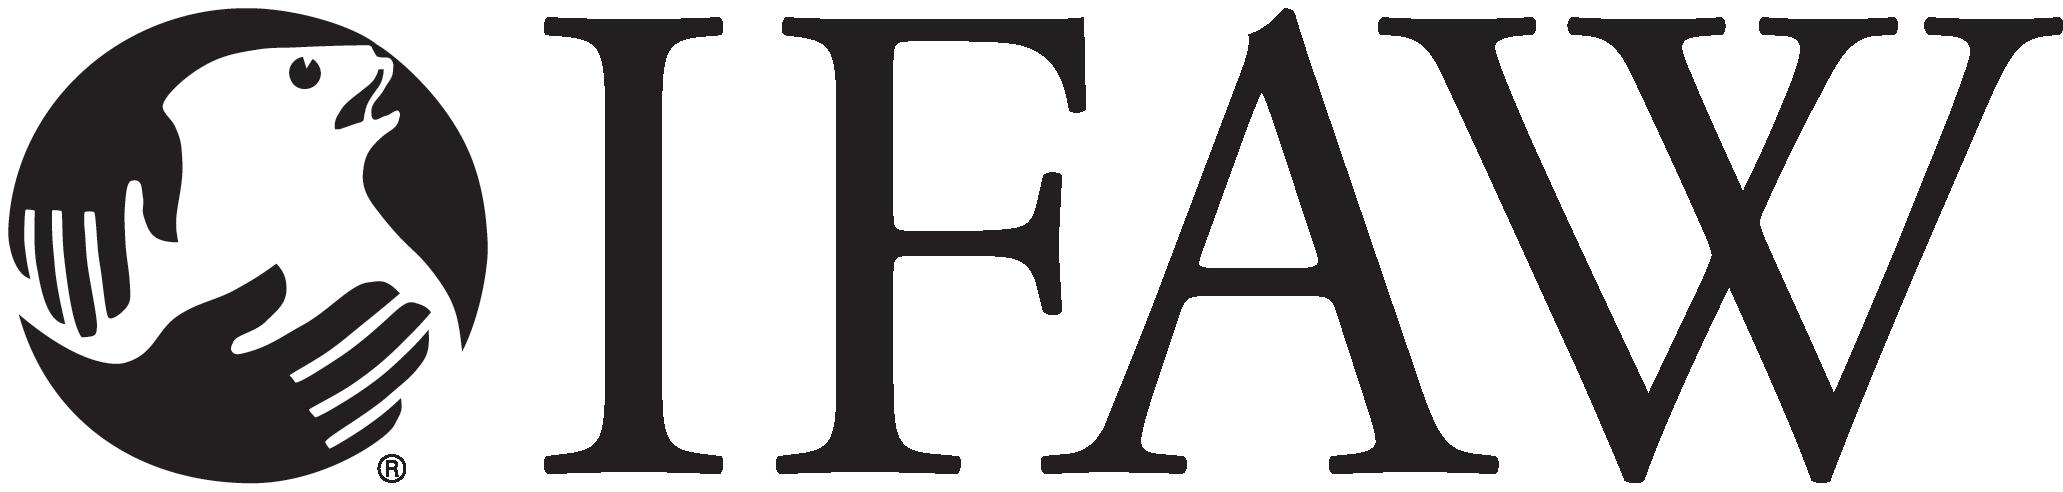 NEWIFAW-rev2-Logo_Horiz_Black.png